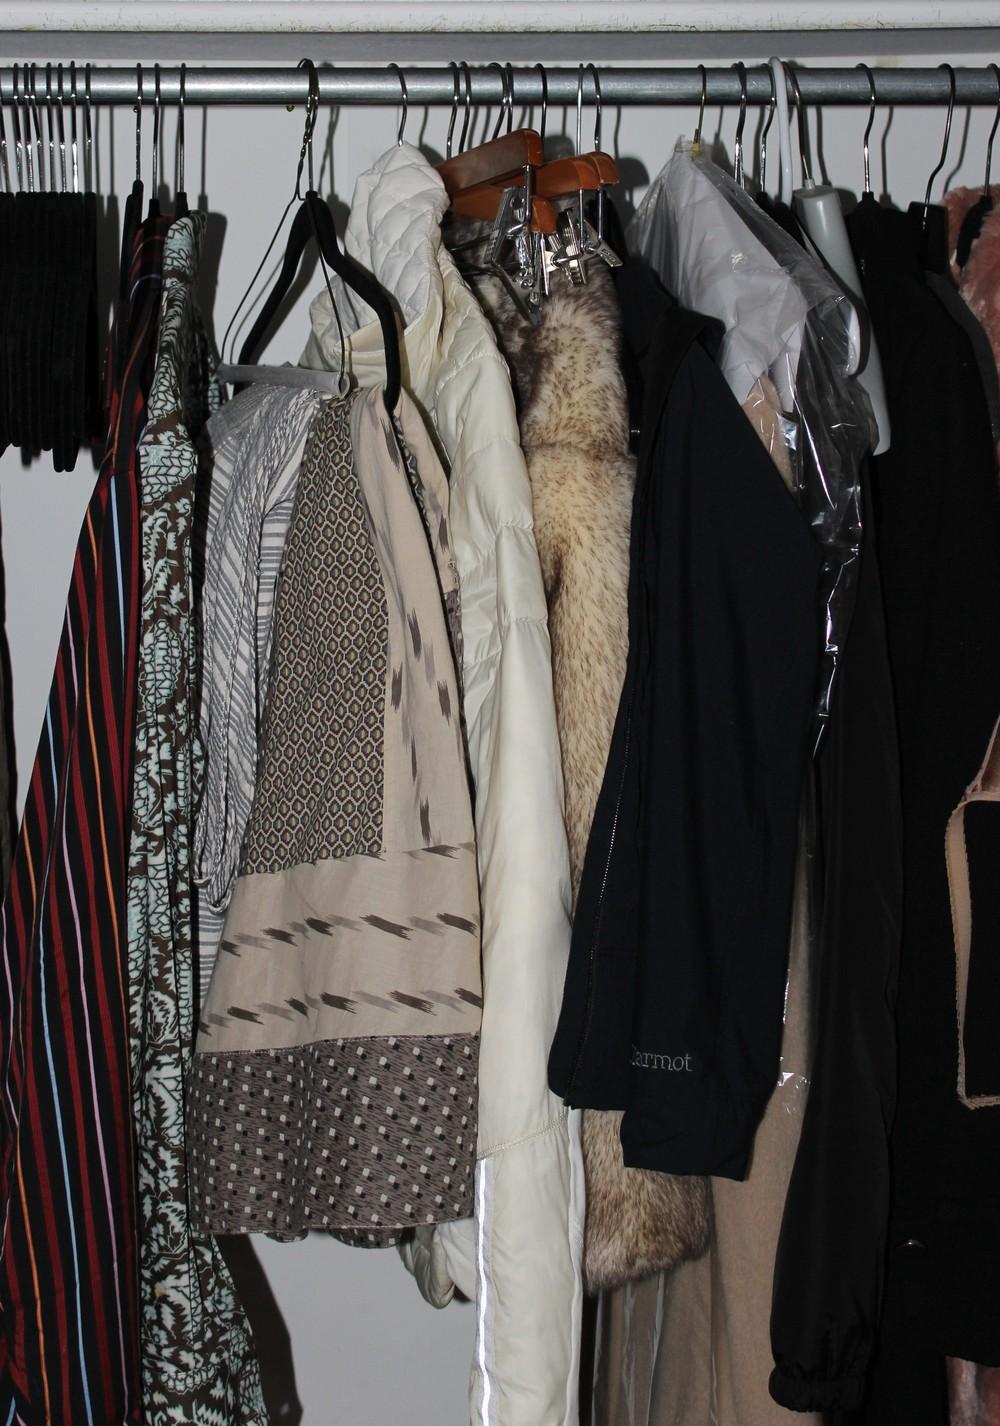 Heidi's closet before